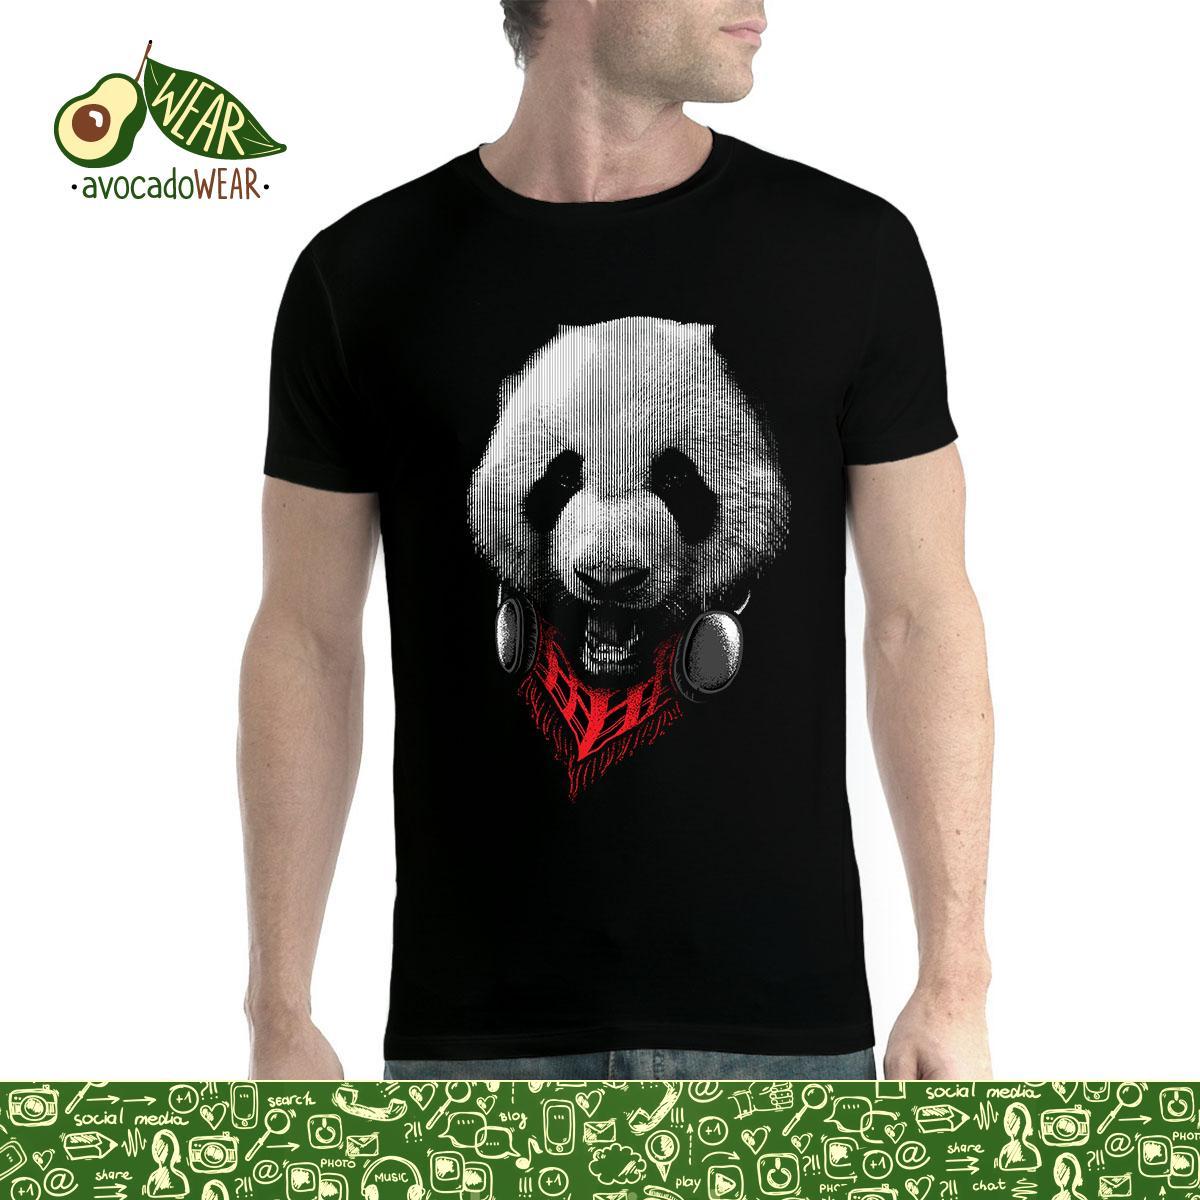 Panda Headphones Mens T shirt XS 5XLStreetwear Funny Print Clothing Hip Tope Mans T Shirt Tops Tees Fashion Classic Black Style in T Shirts from Men 39 s Clothing